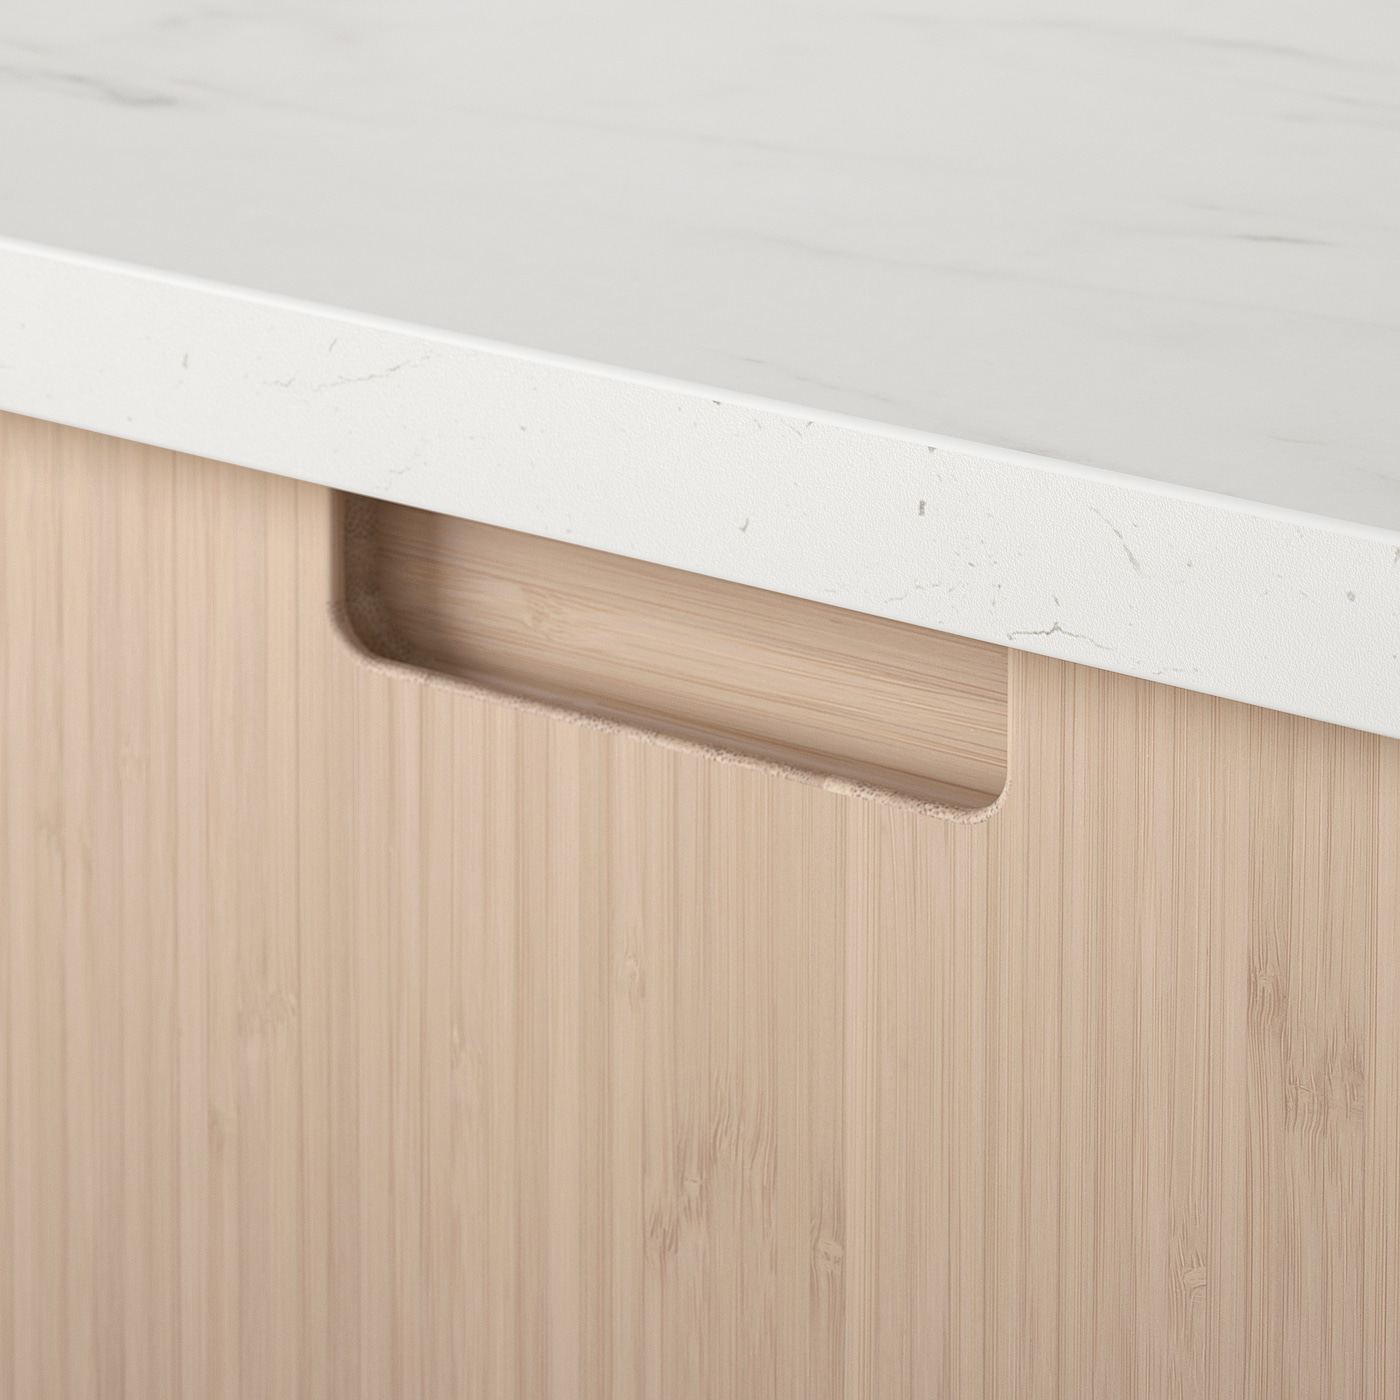 FRÖJERED Drawer front, light bamboo, 60x20 cm